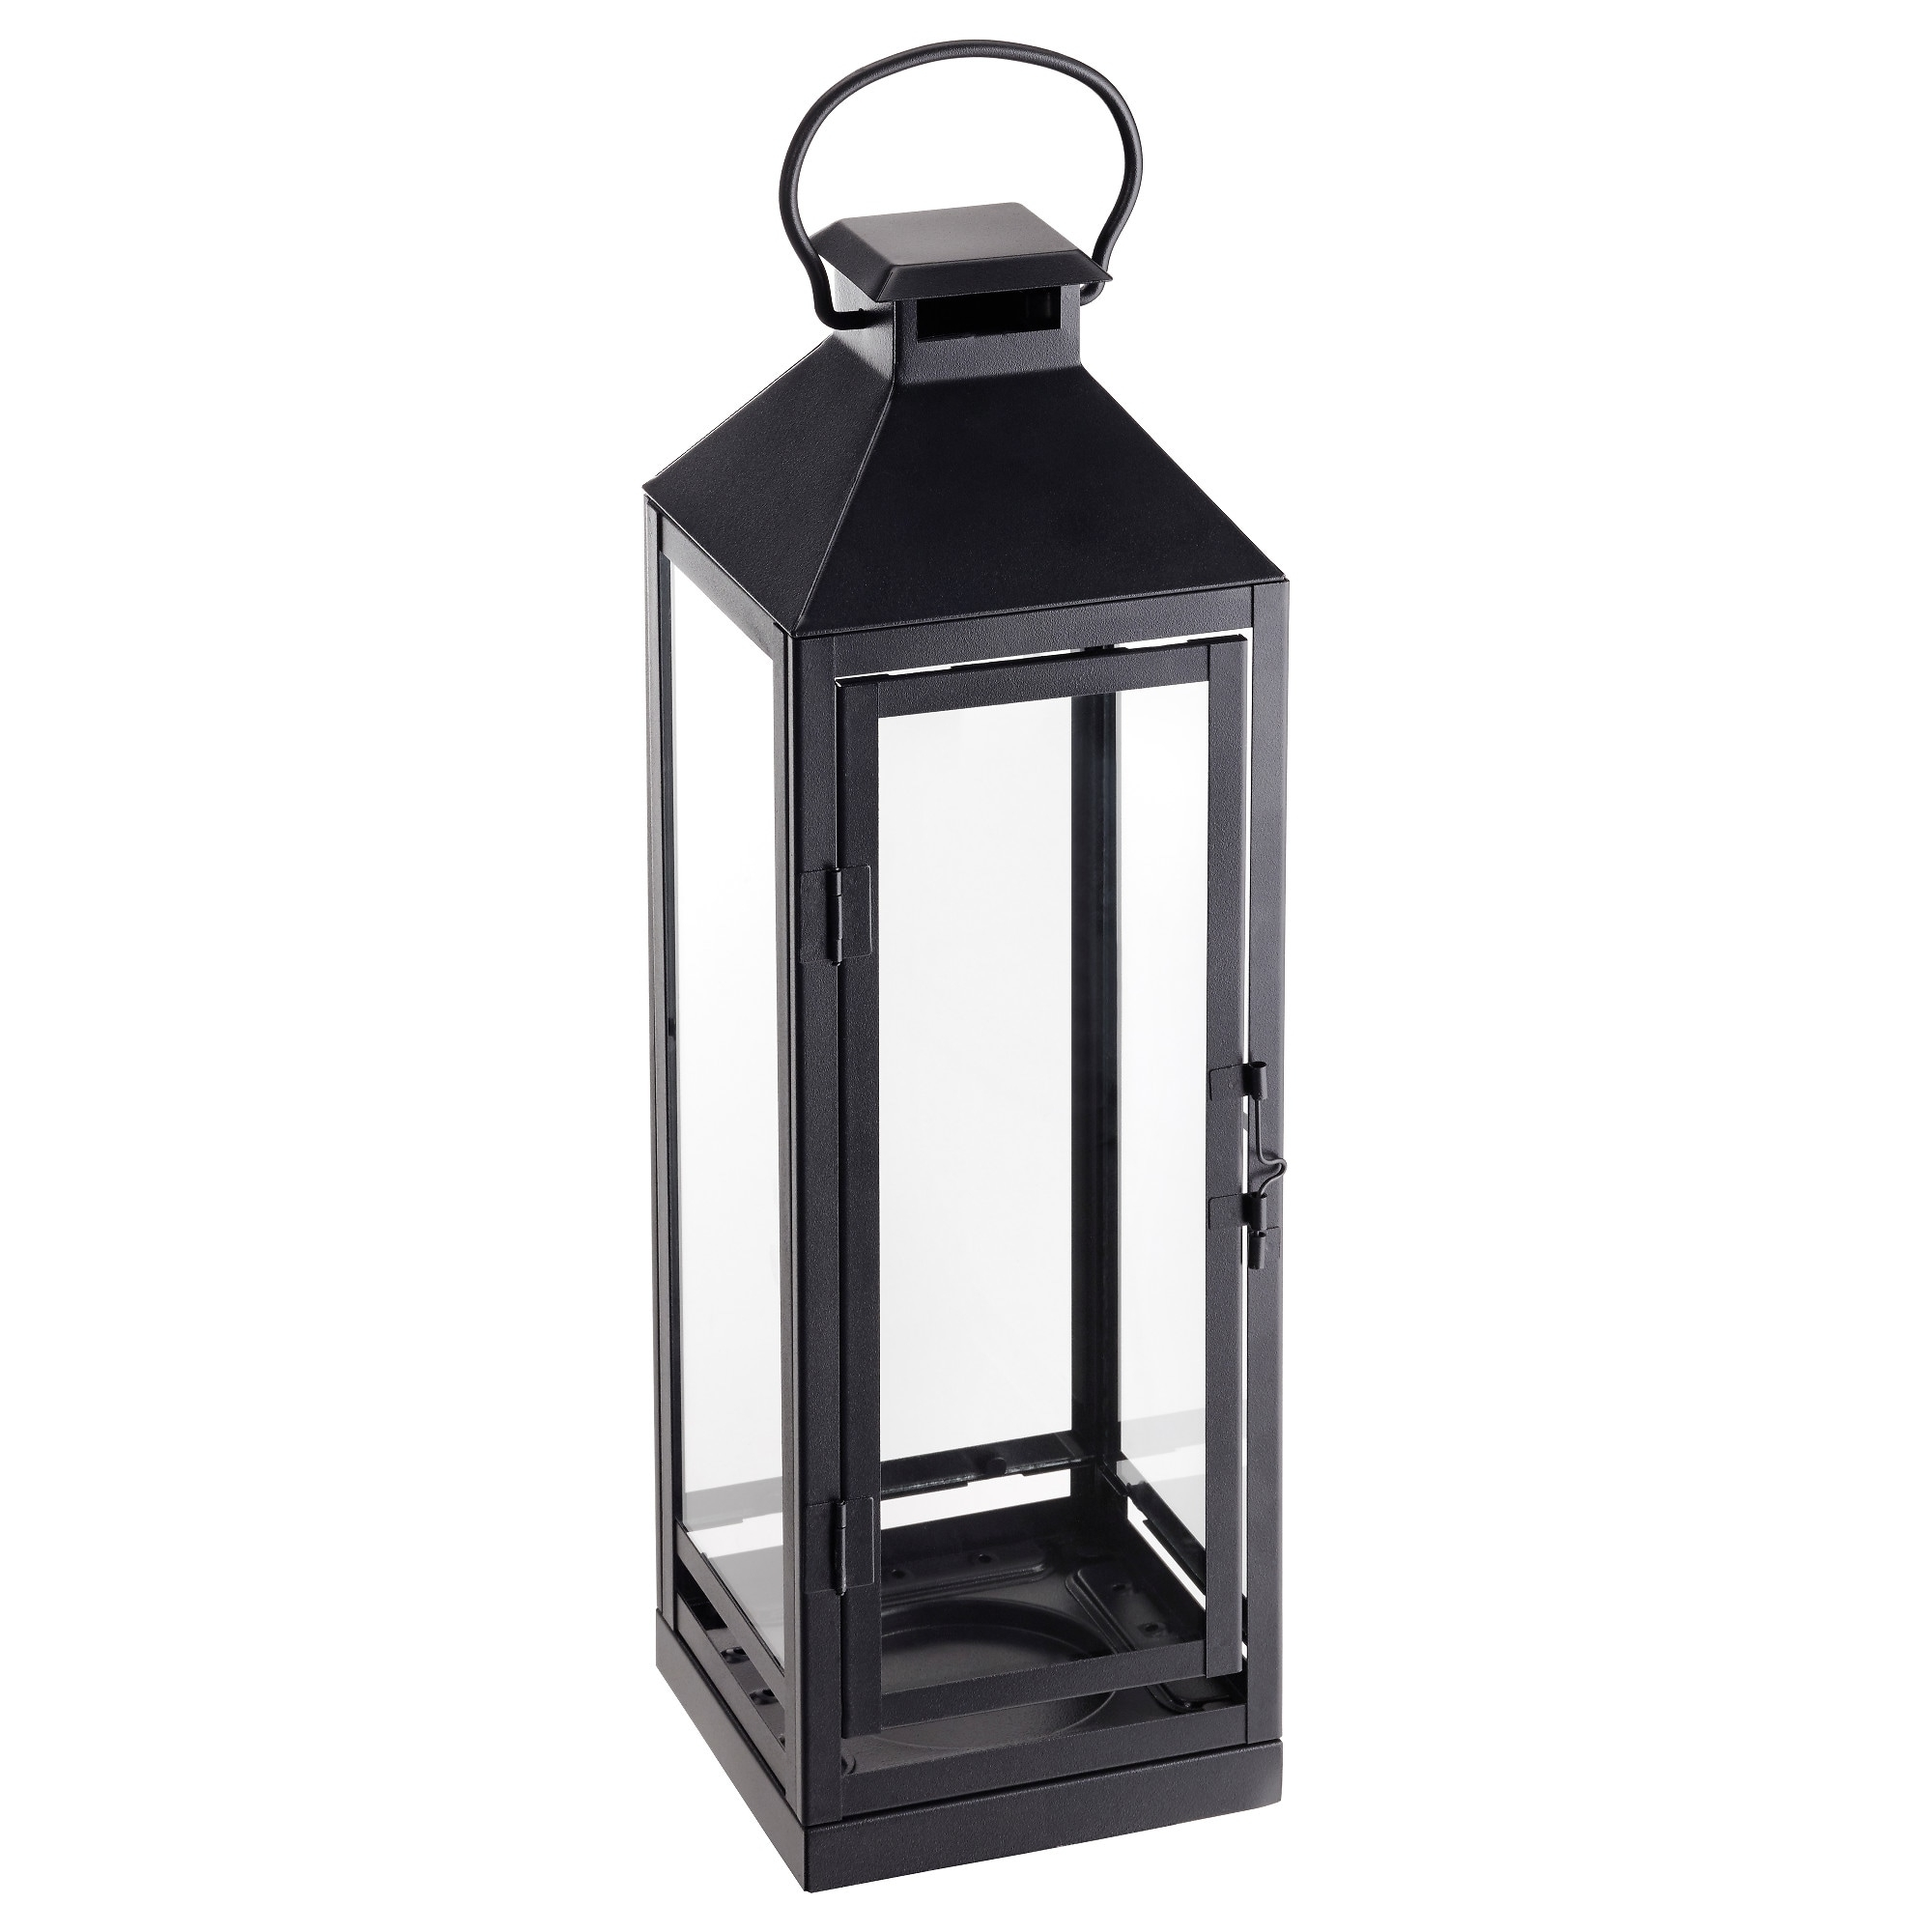 Outdoor Standing Lanterns Throughout Fashionable Lanterns & Candle Lanterns – Ikea (View 20 of 20)